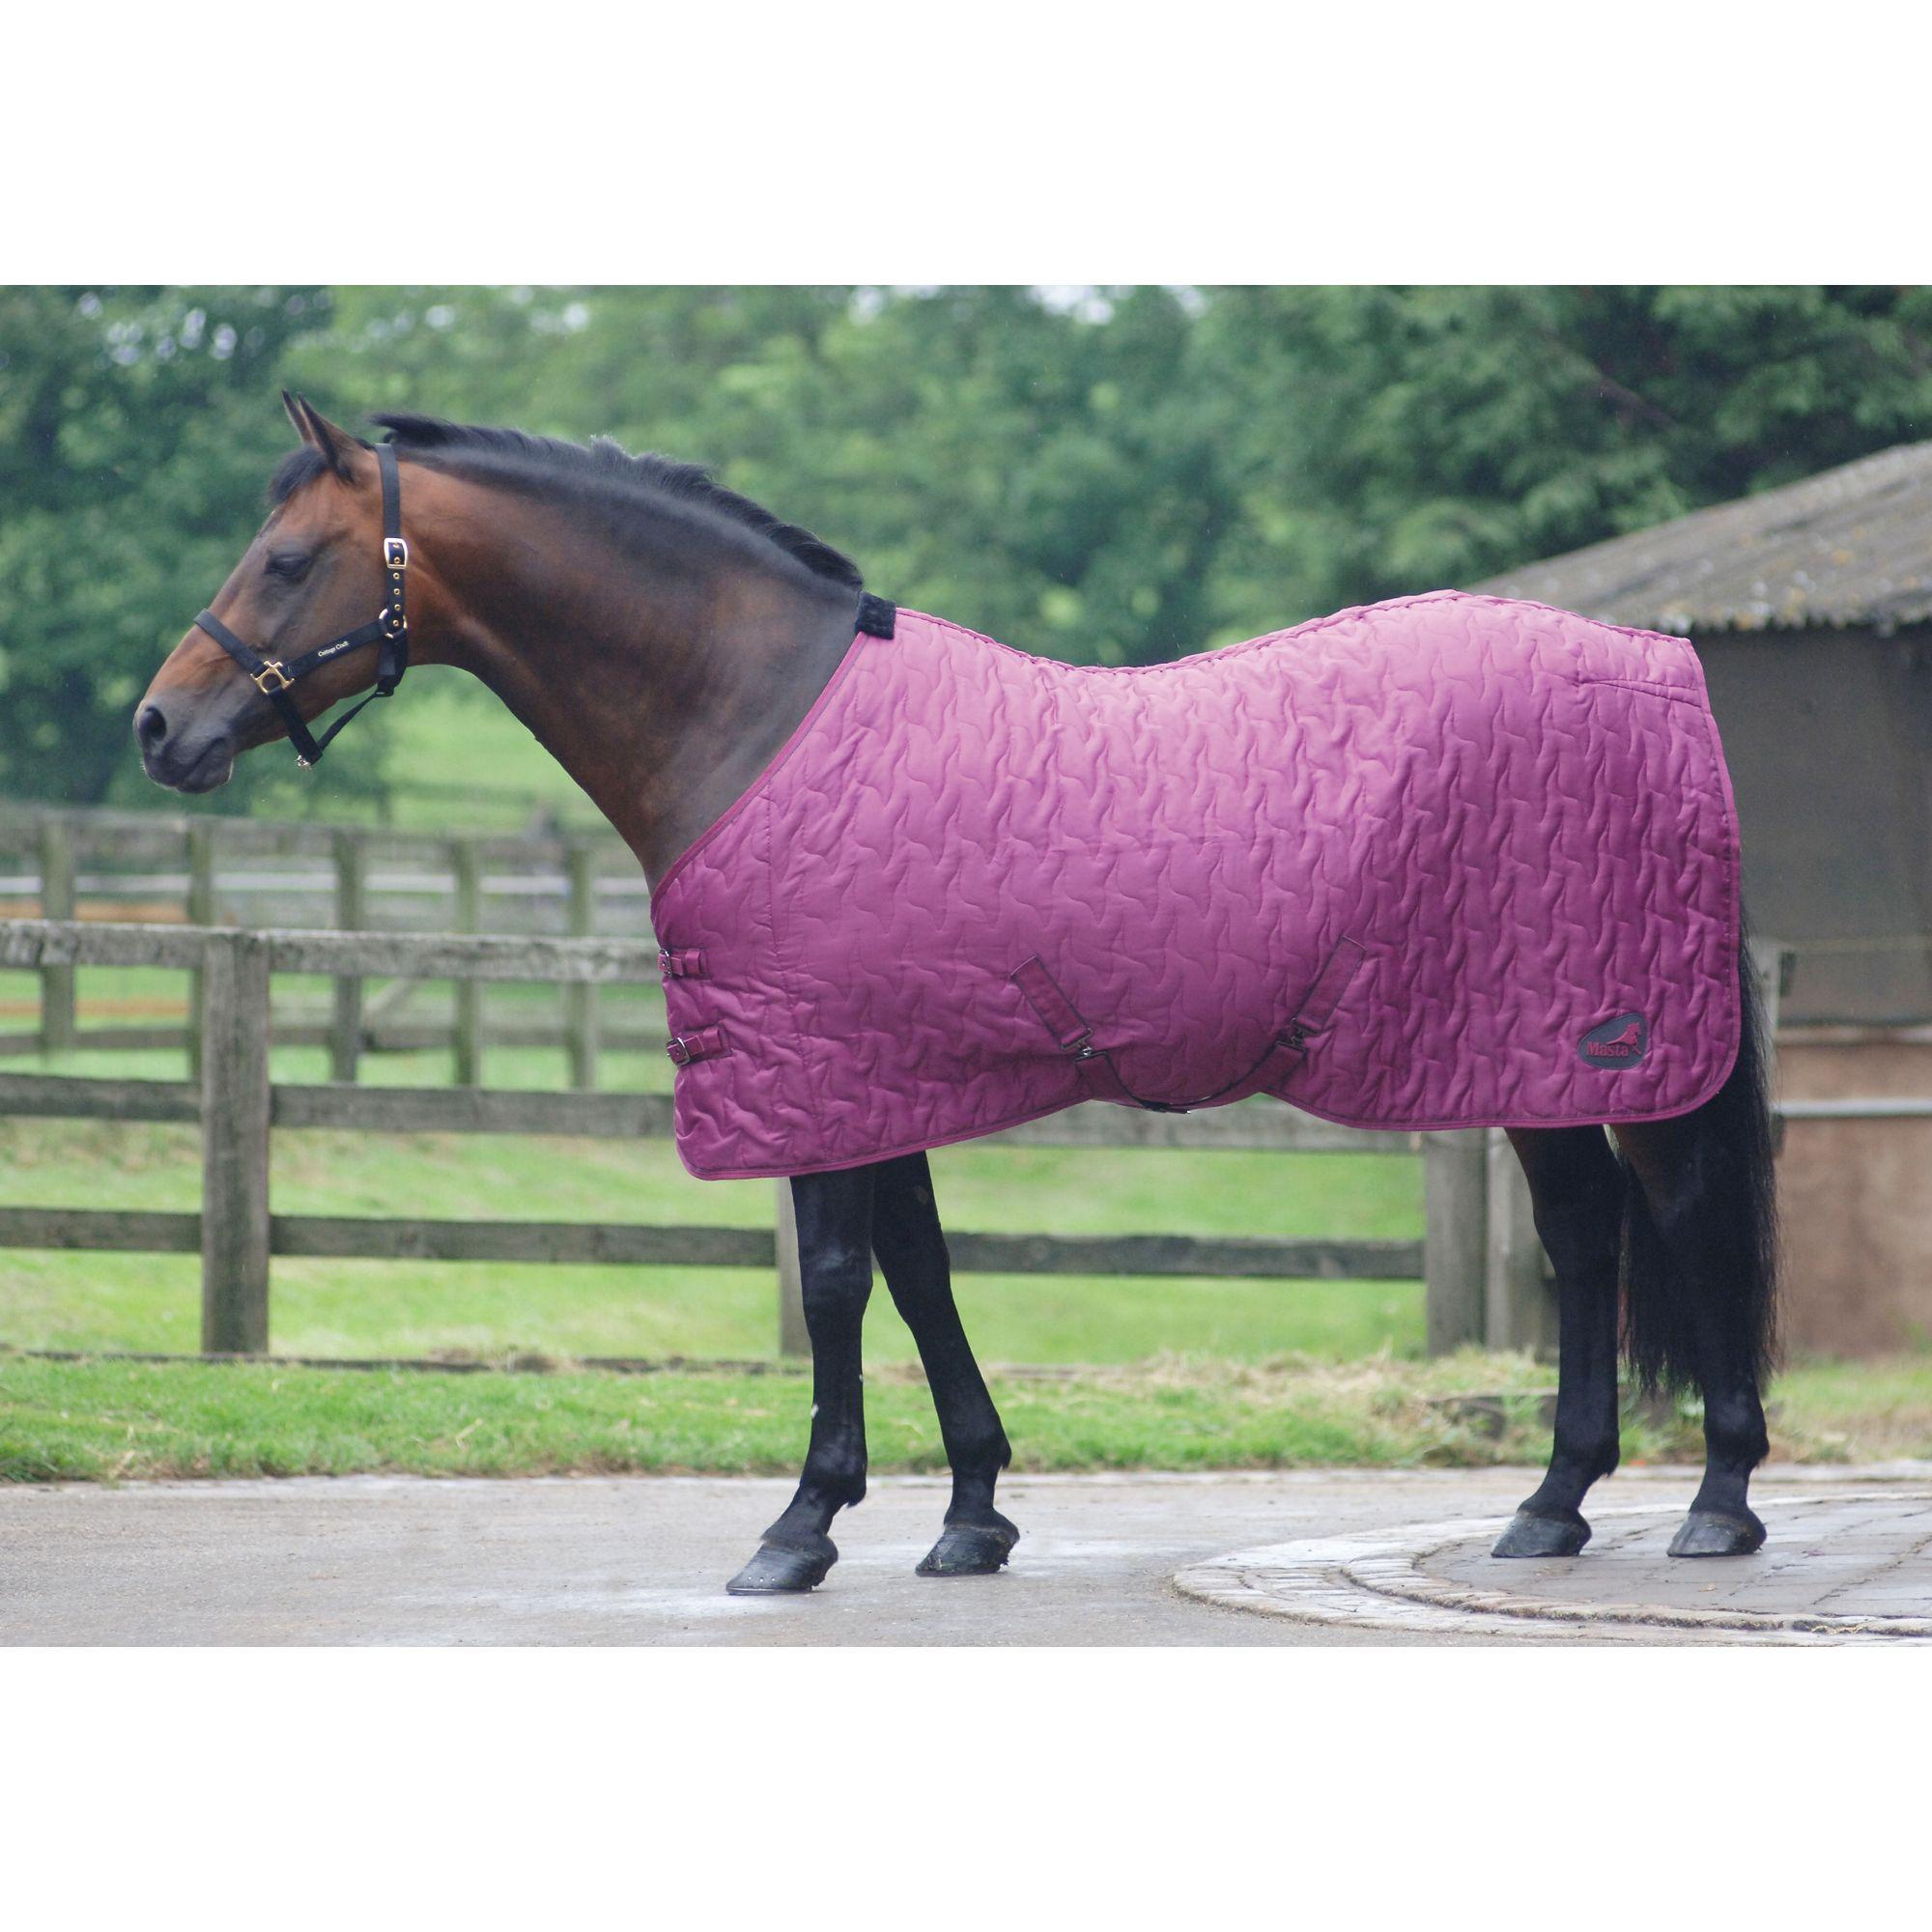 Masta Quiltmasta Light Horse Rug, Cherry, 6ft